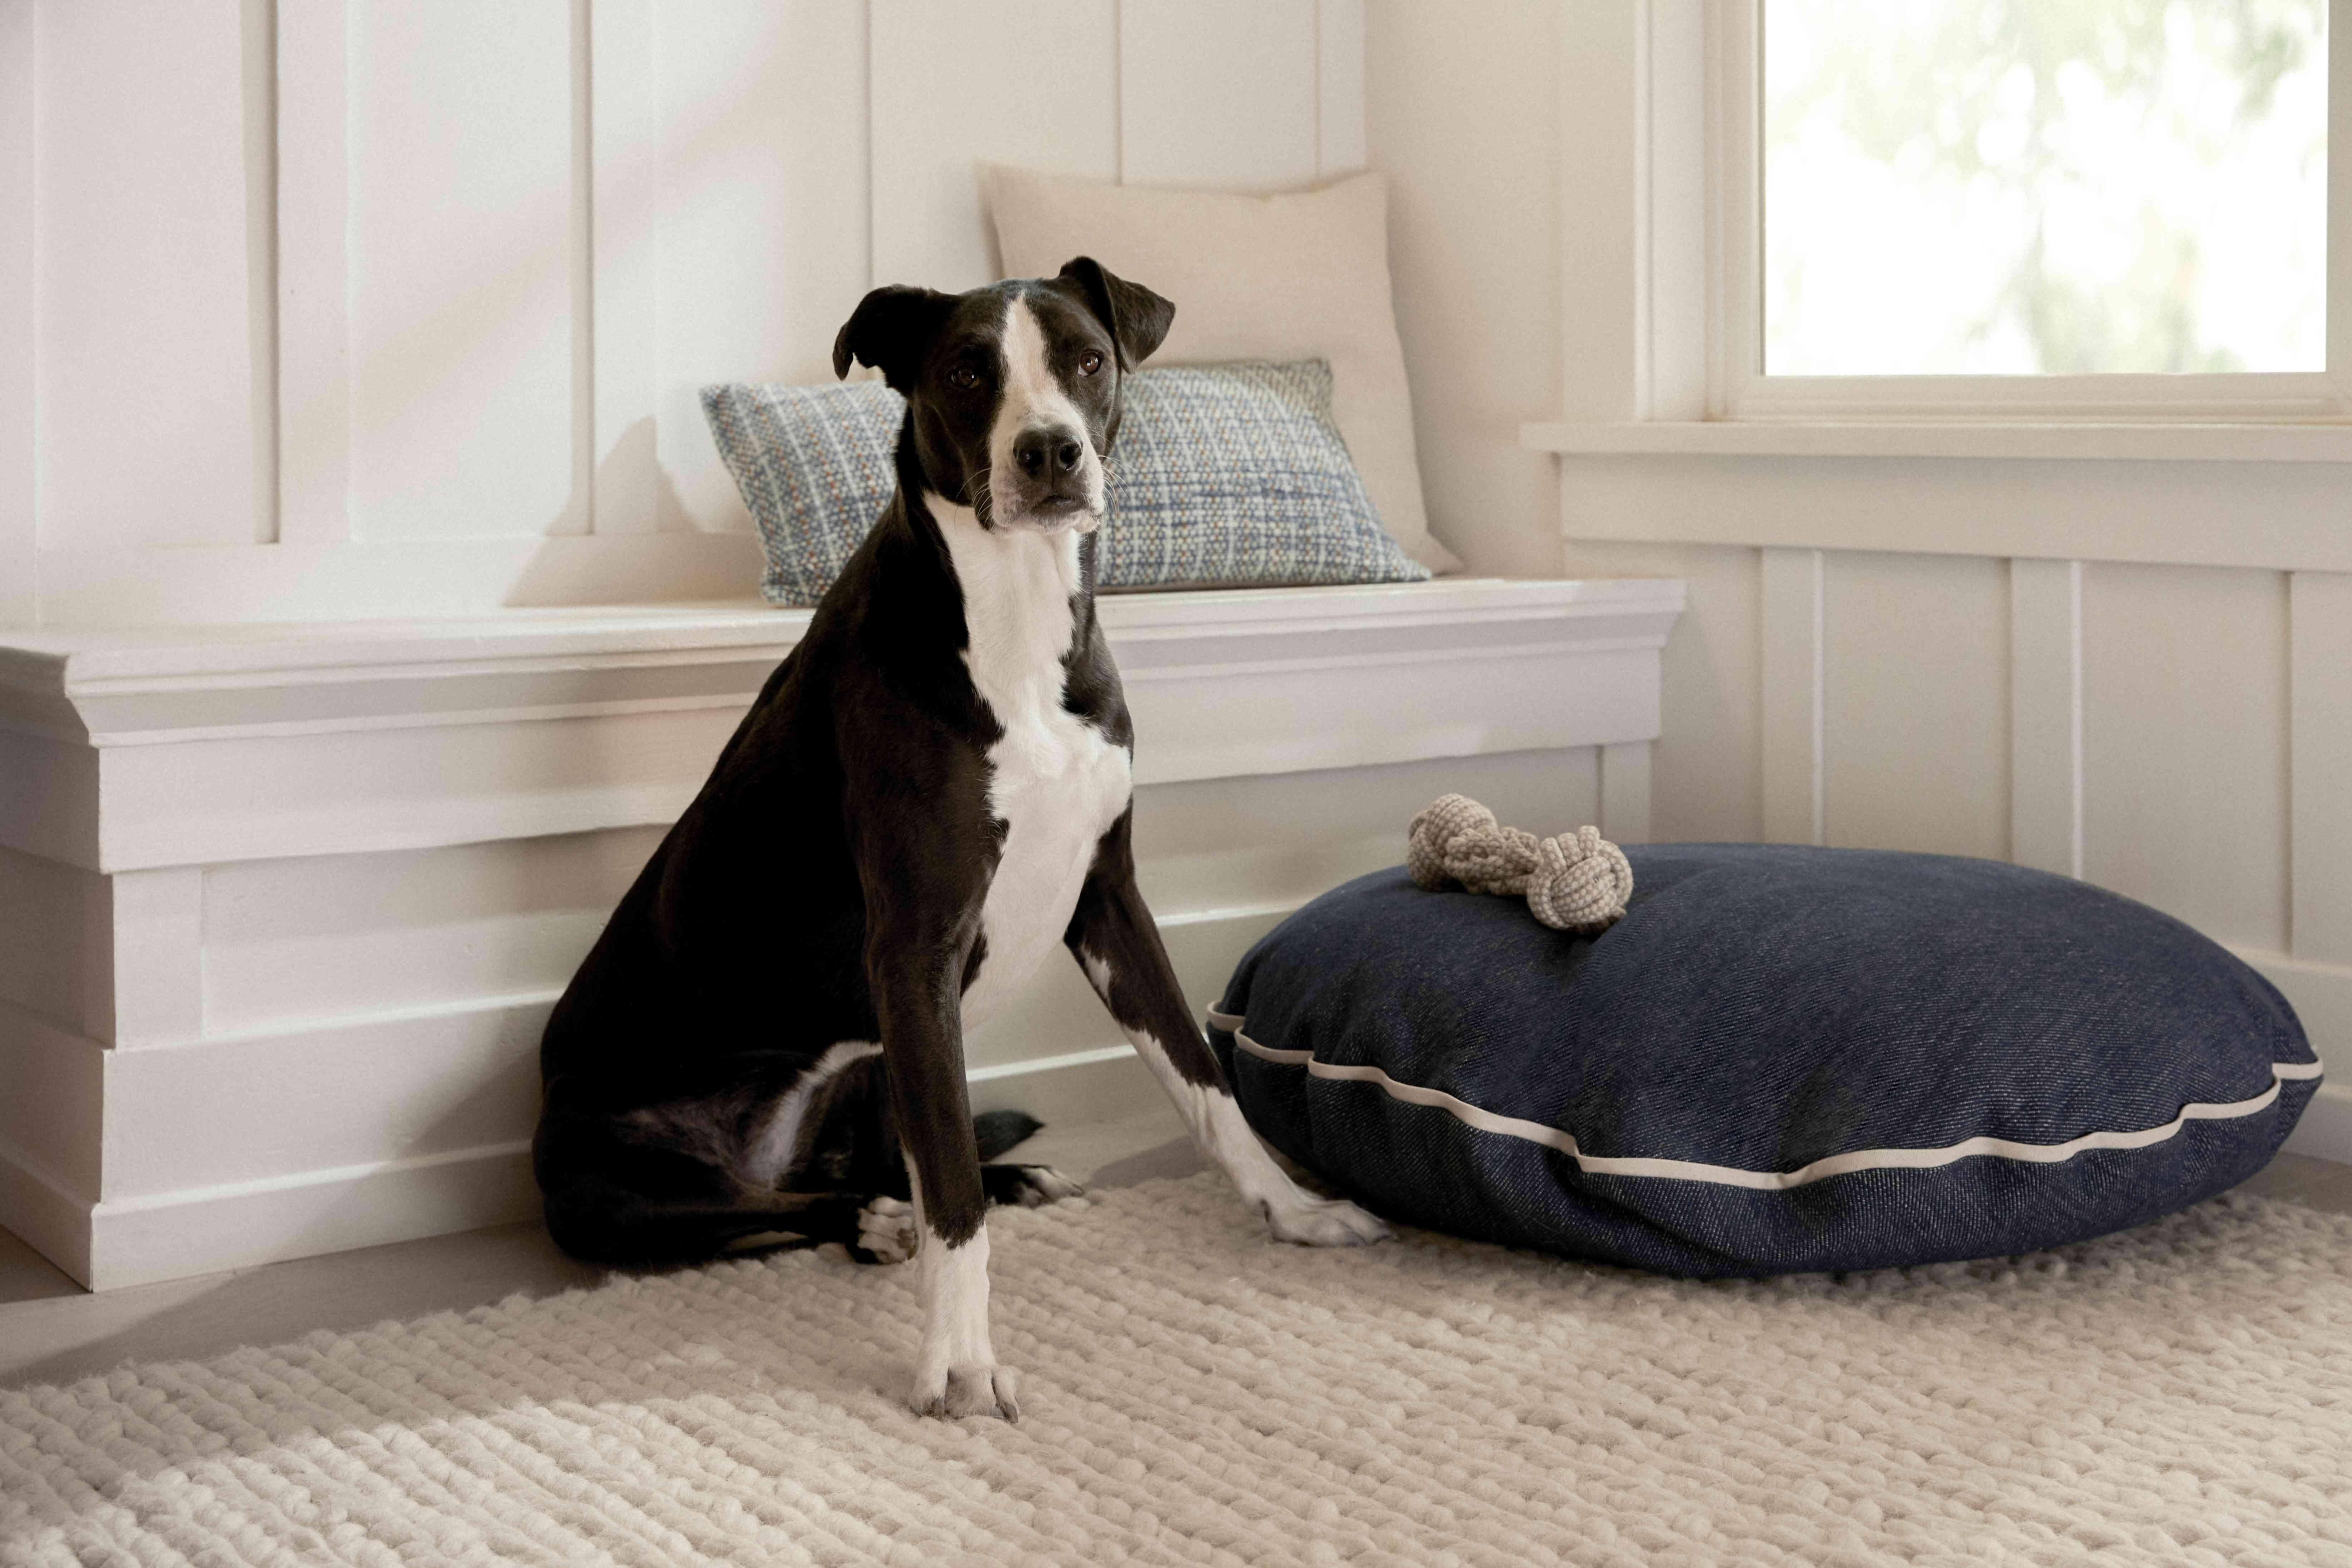 Madewell x Parachute denim dog bed